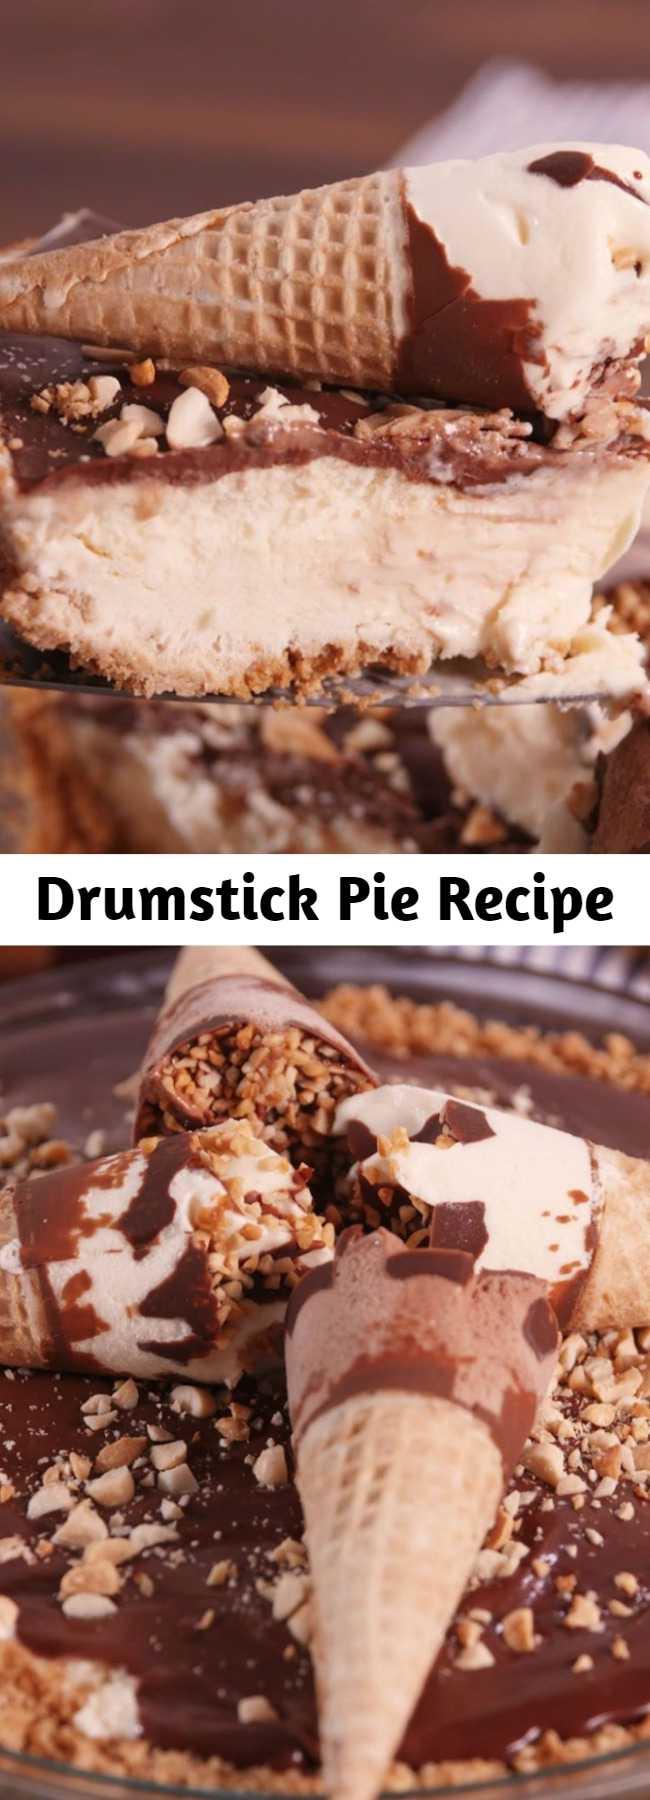 Drumstick Pie Recipe - The sugar cone crust on this Drumstick pie is pure genius. Never sick of Drumsticks.